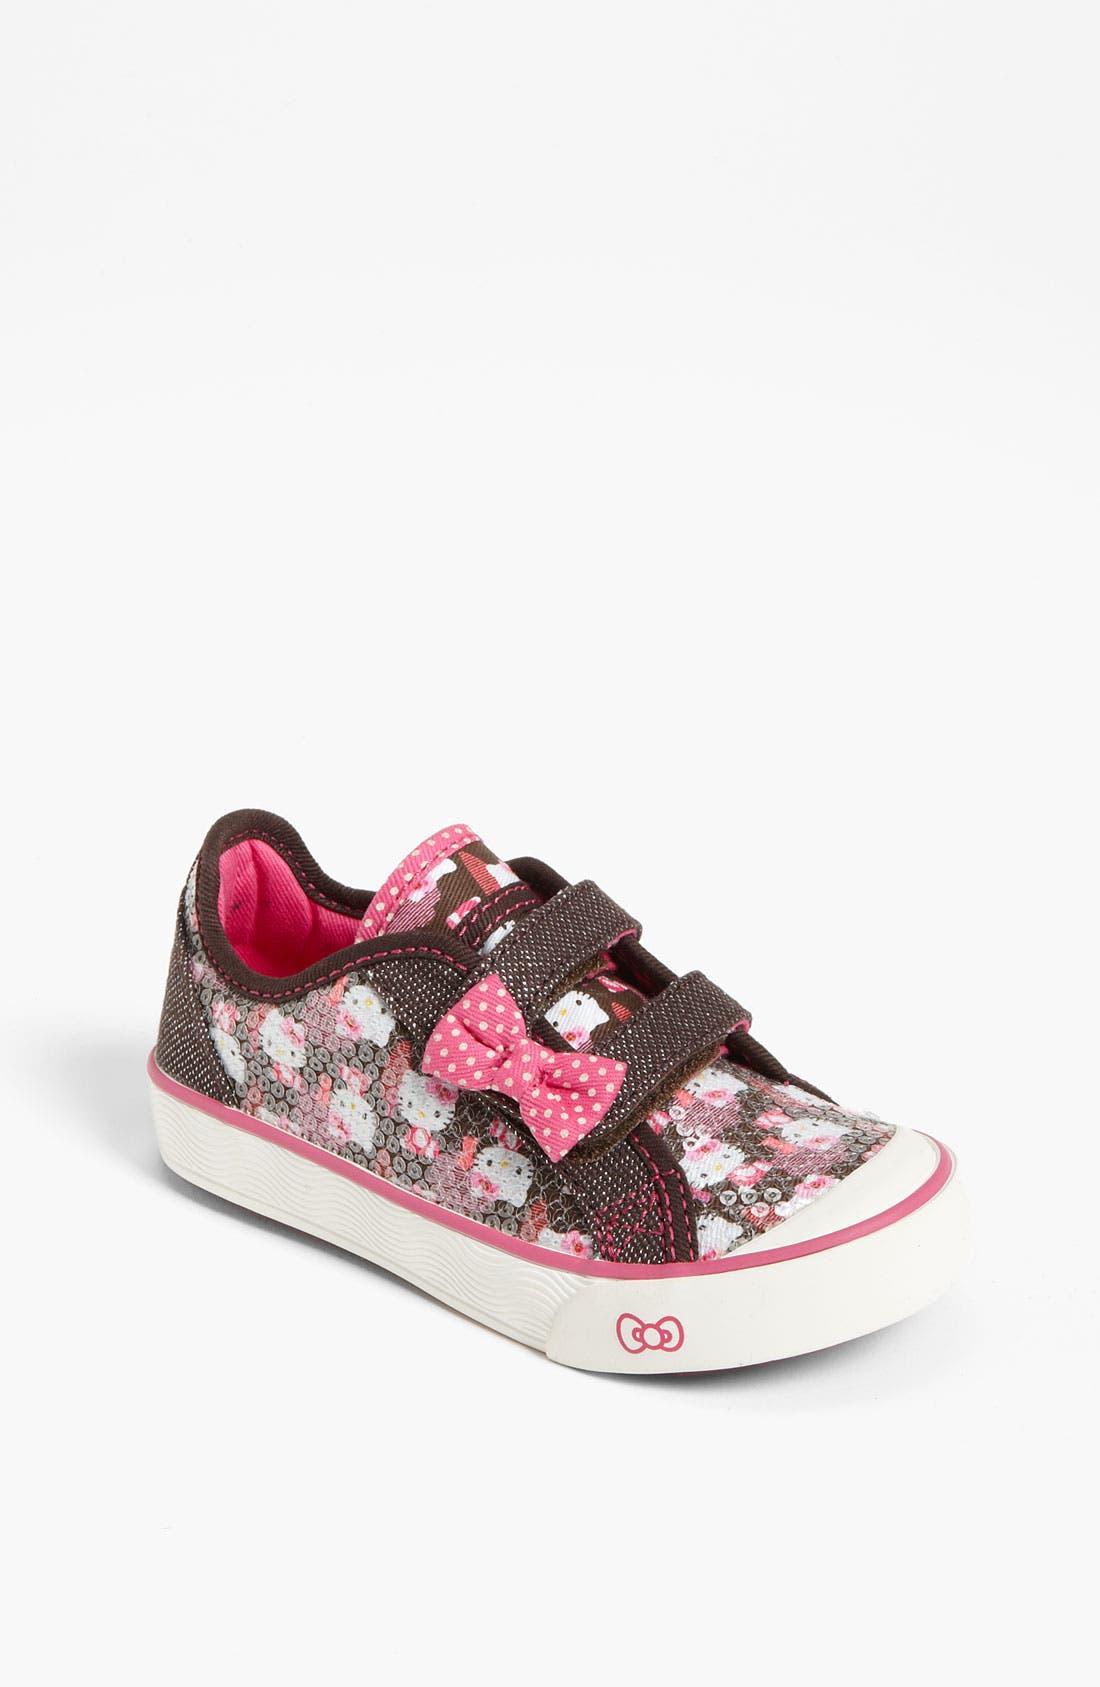 Alternate Image 1 Selected - Keds® 'Mimmy' Sneaker (Walker & Toddler)